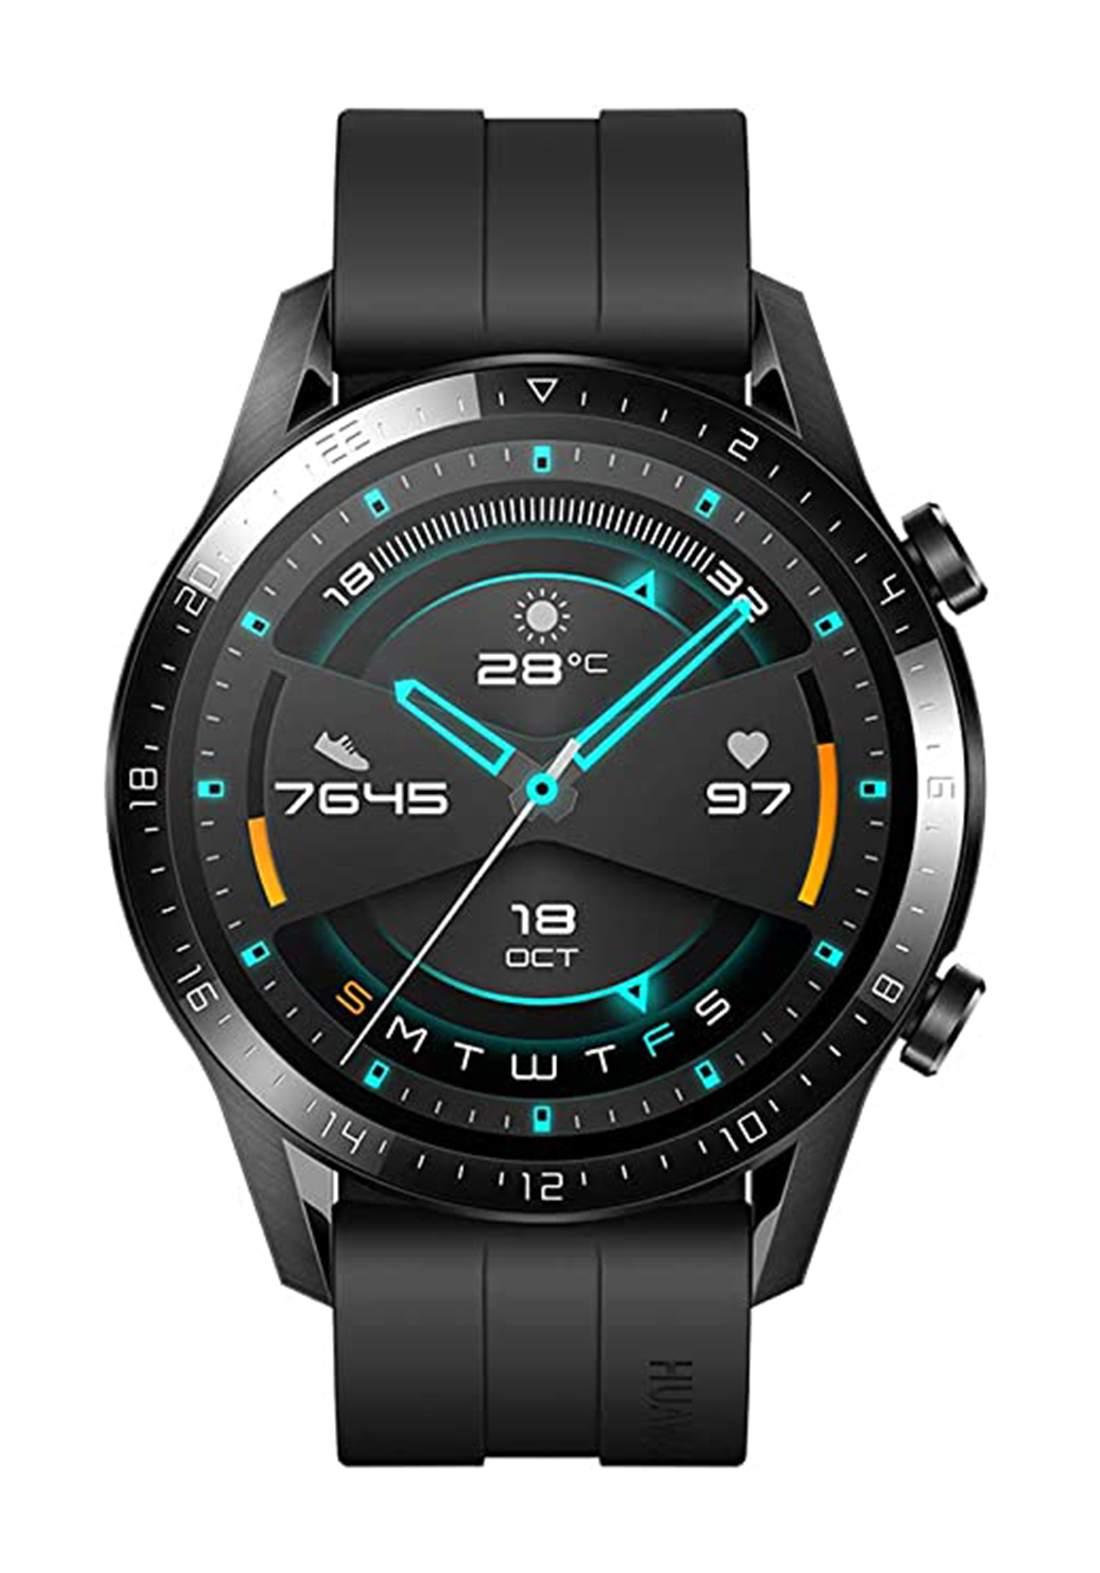 Huawei Watch GT 2  ساعة ذكية